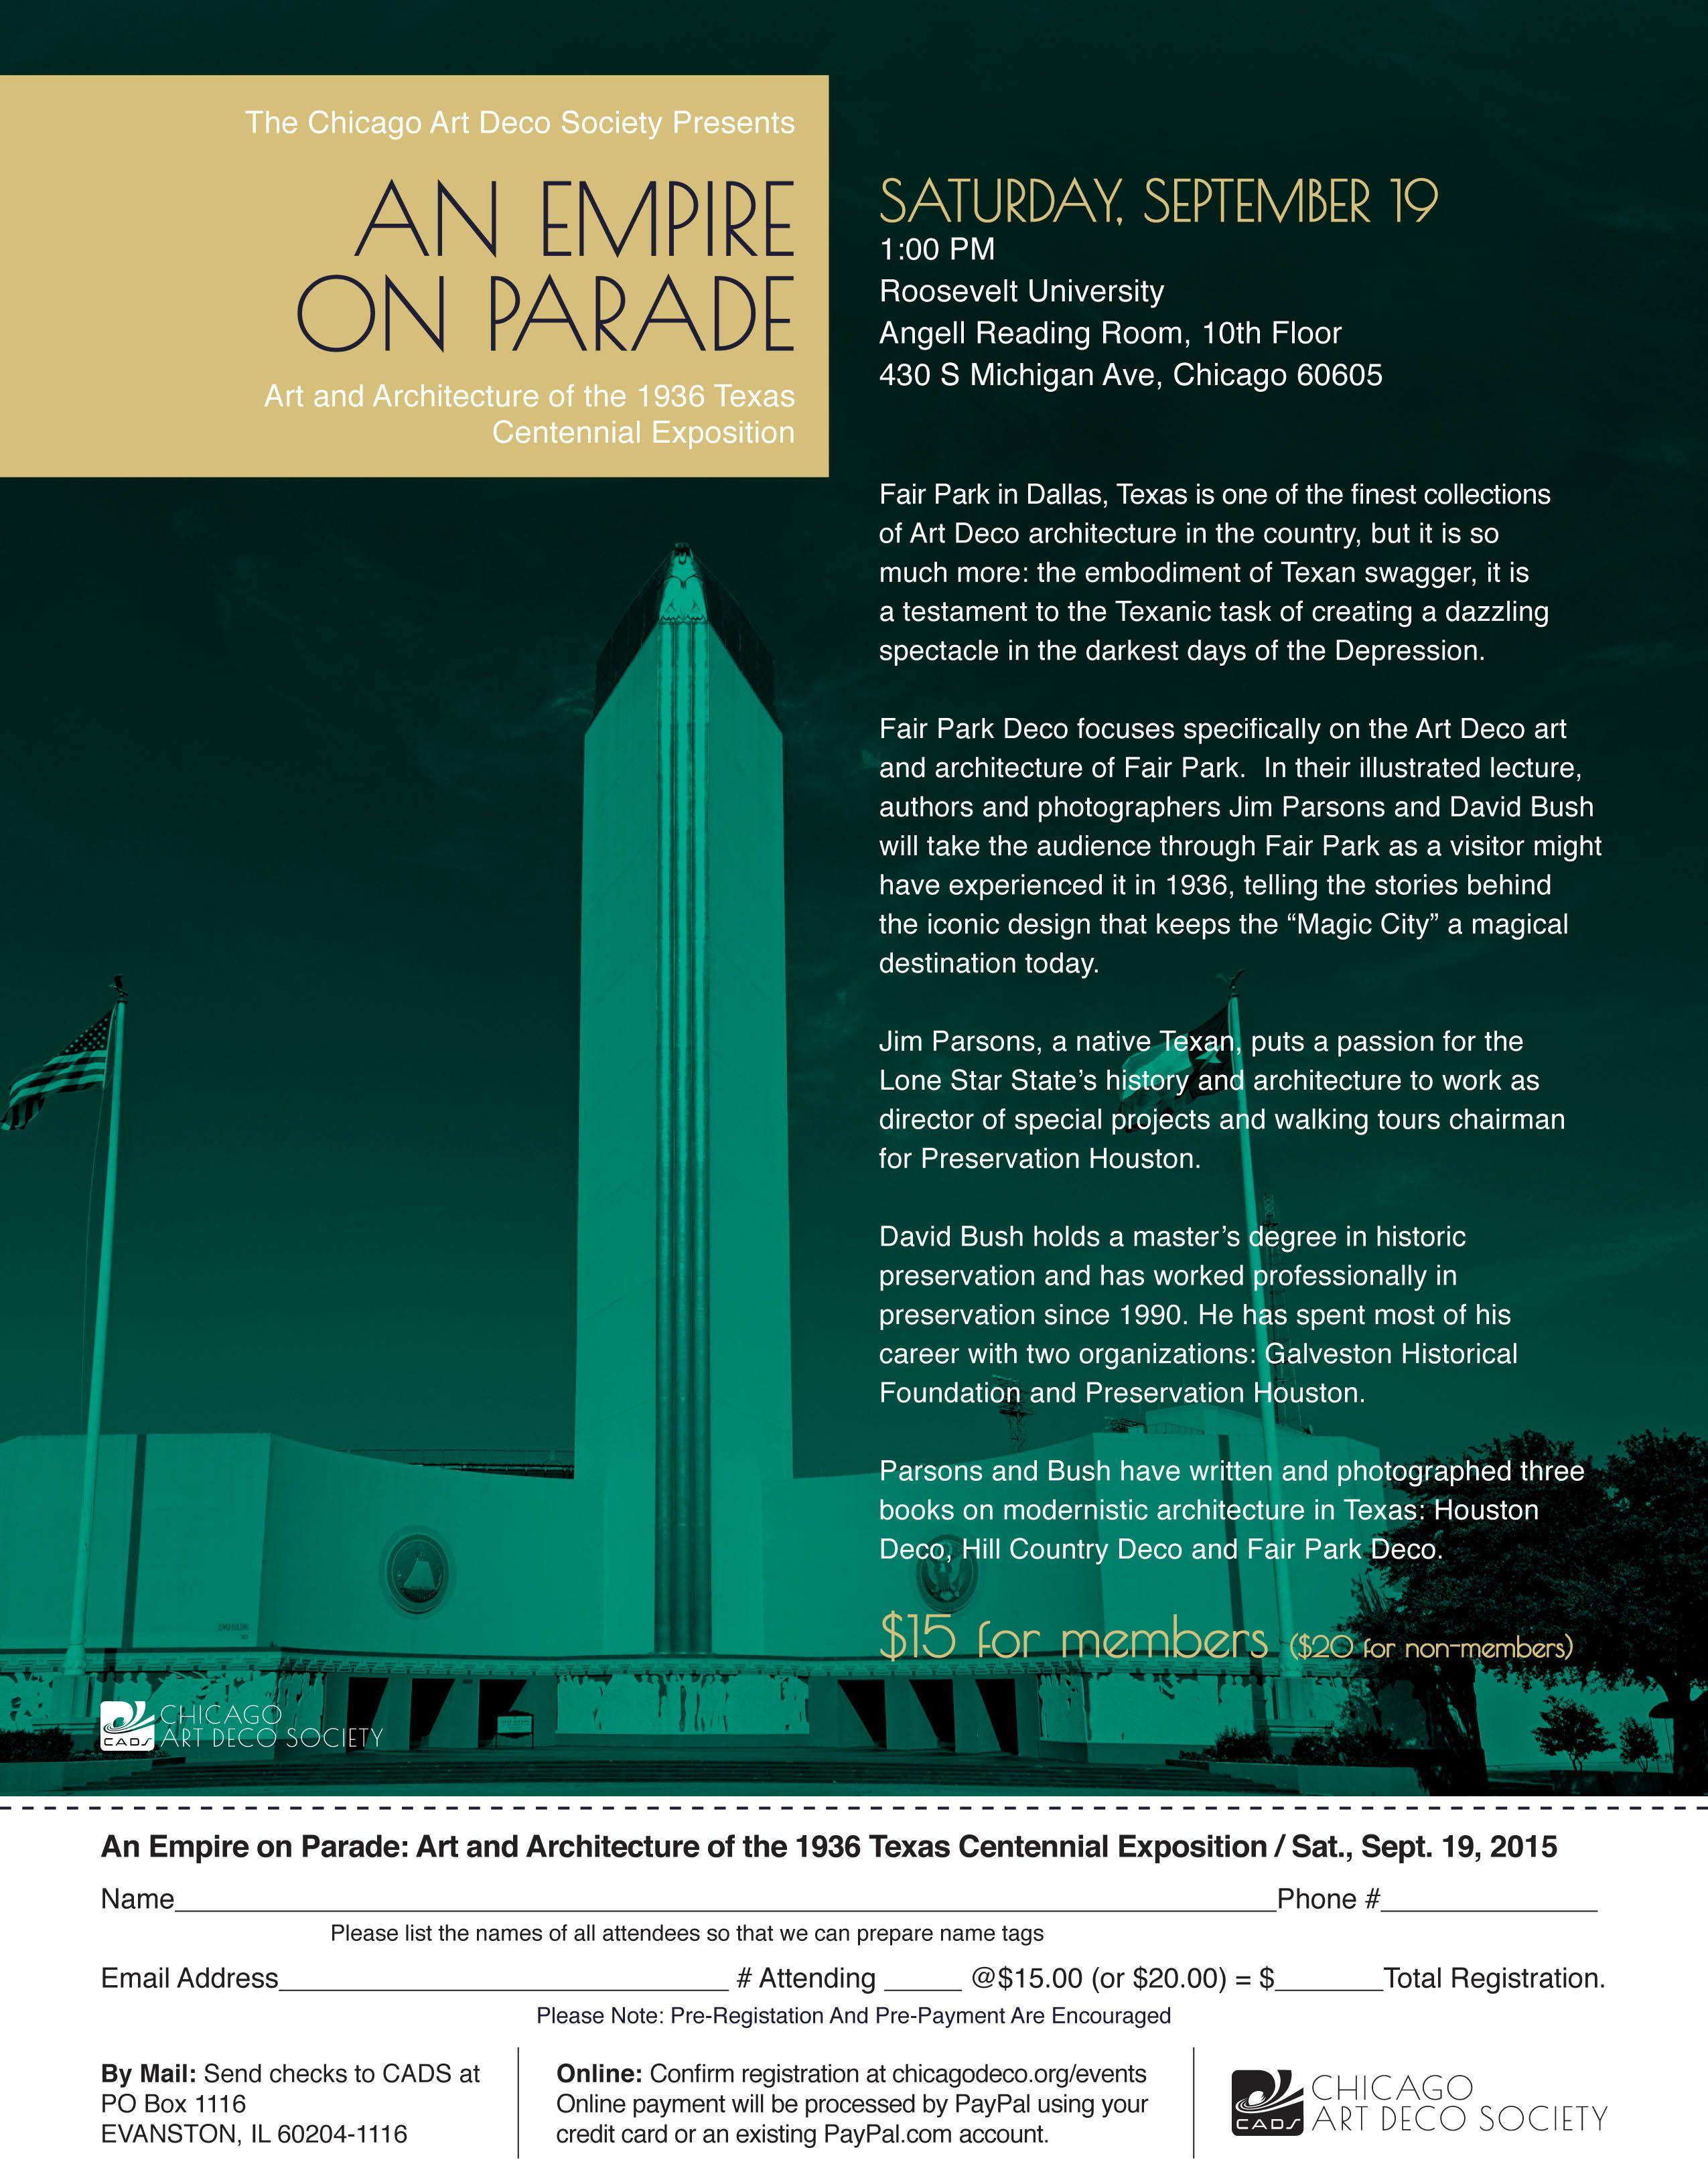 Roosevelt University Email >> Chicago Art Deco Society Events Chicago Art Art Deco Deco